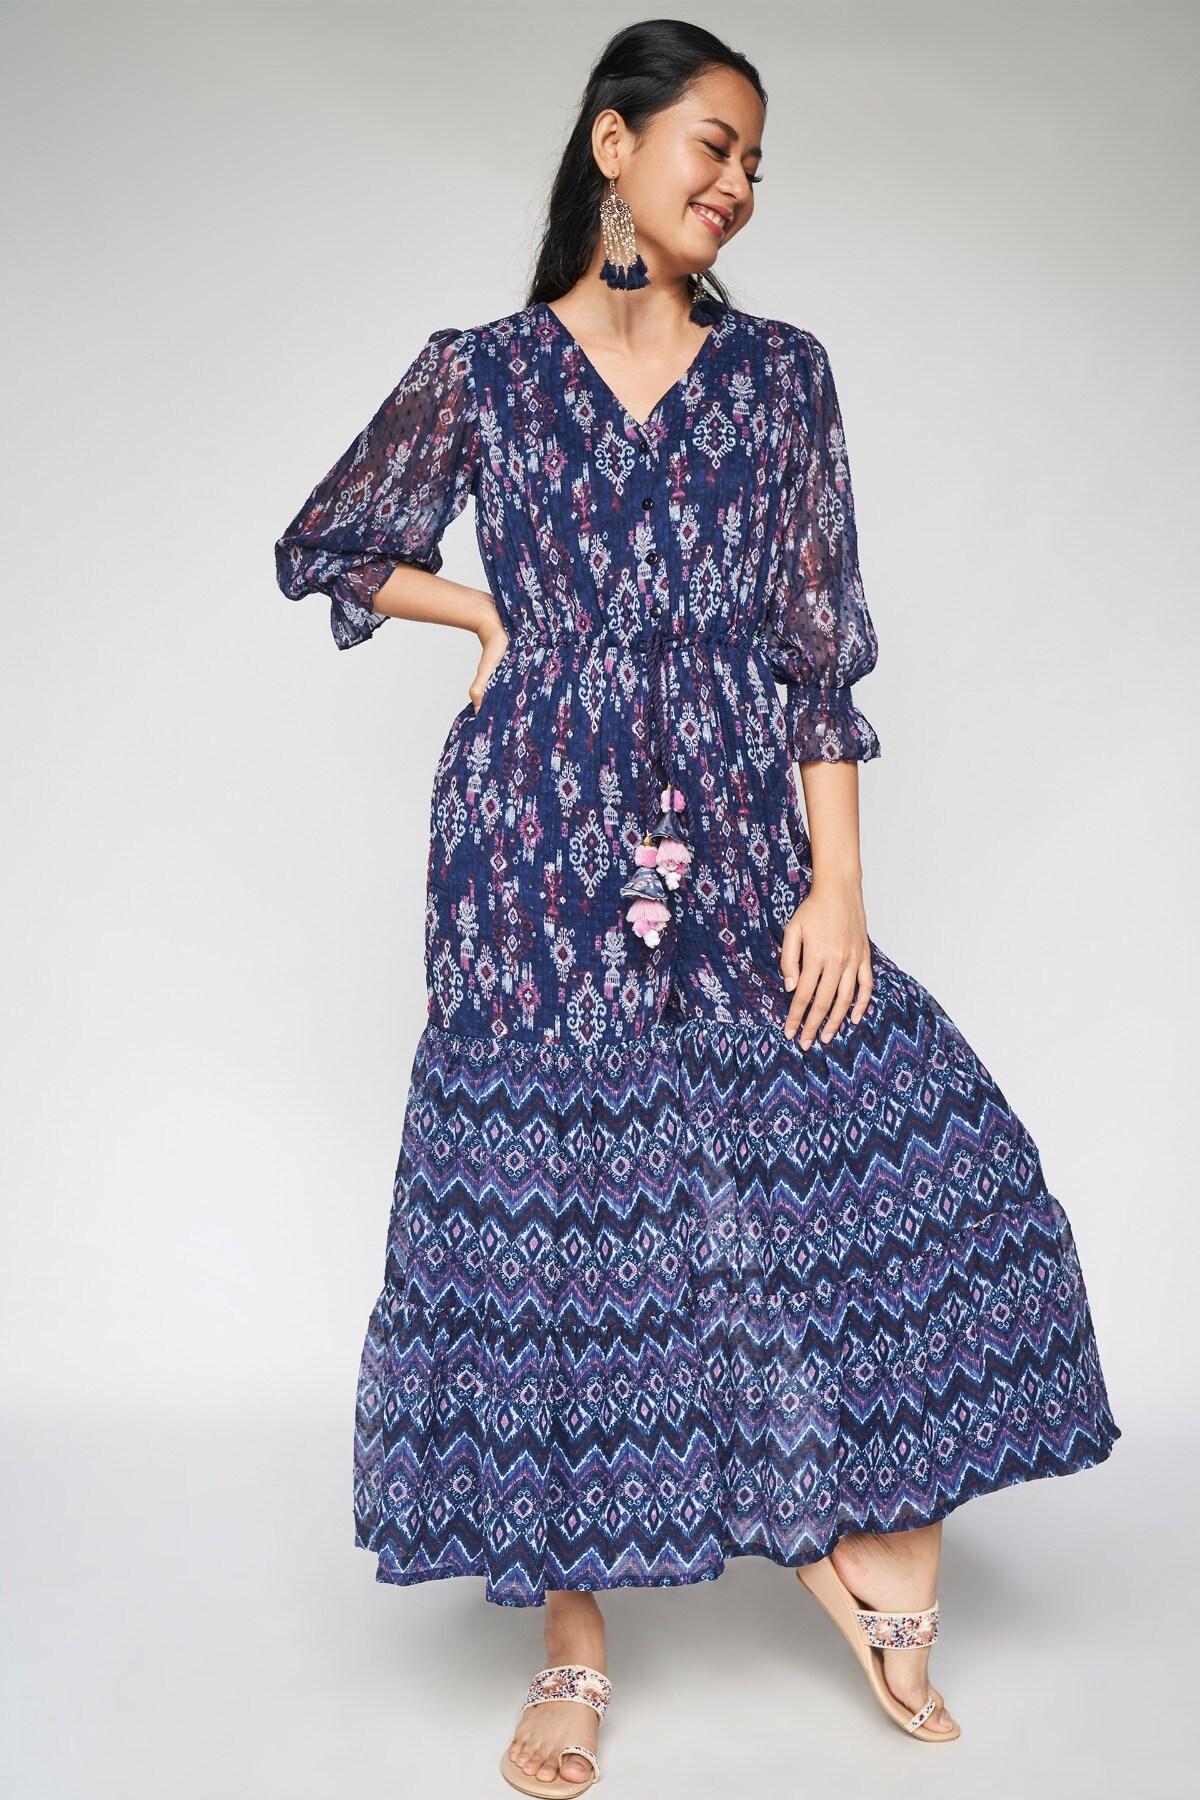 Global Desi   Indigo Tassel Fit and Flare Jumpsuit